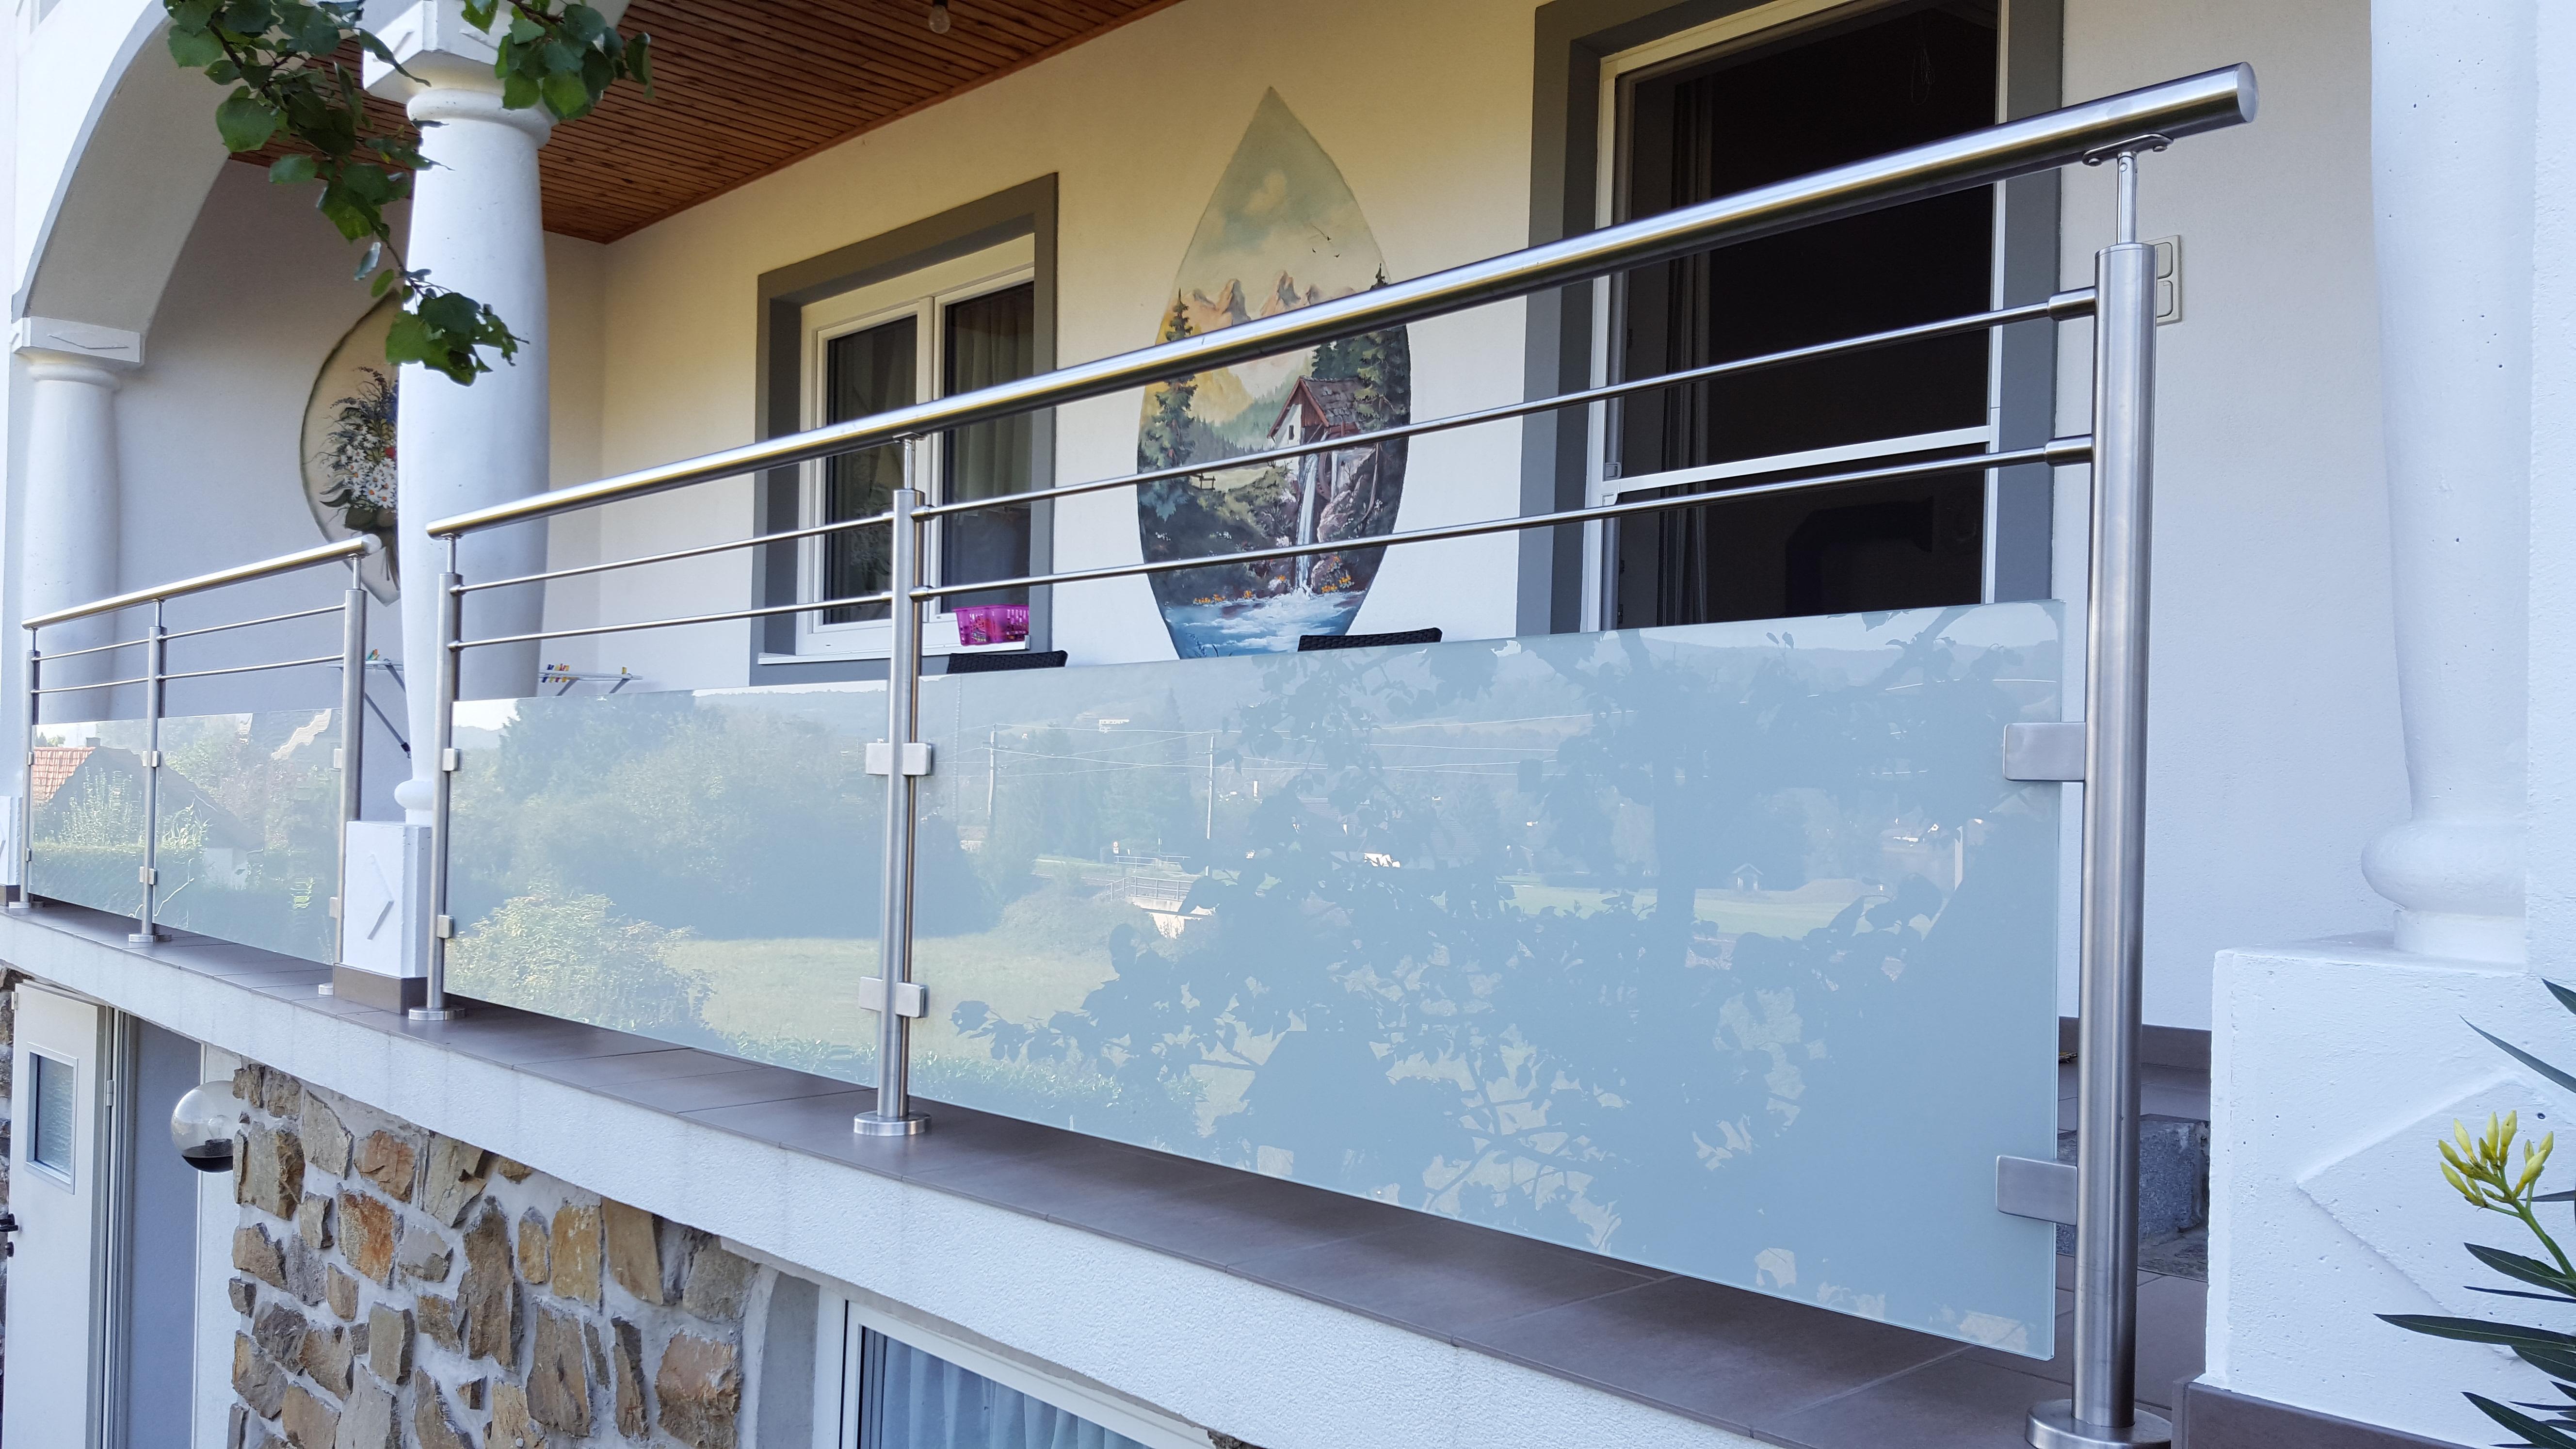 edelstahlgel nder mit glas balkongel nder balkon edelstahl altenglan kusel terrassengel nder. Black Bedroom Furniture Sets. Home Design Ideas